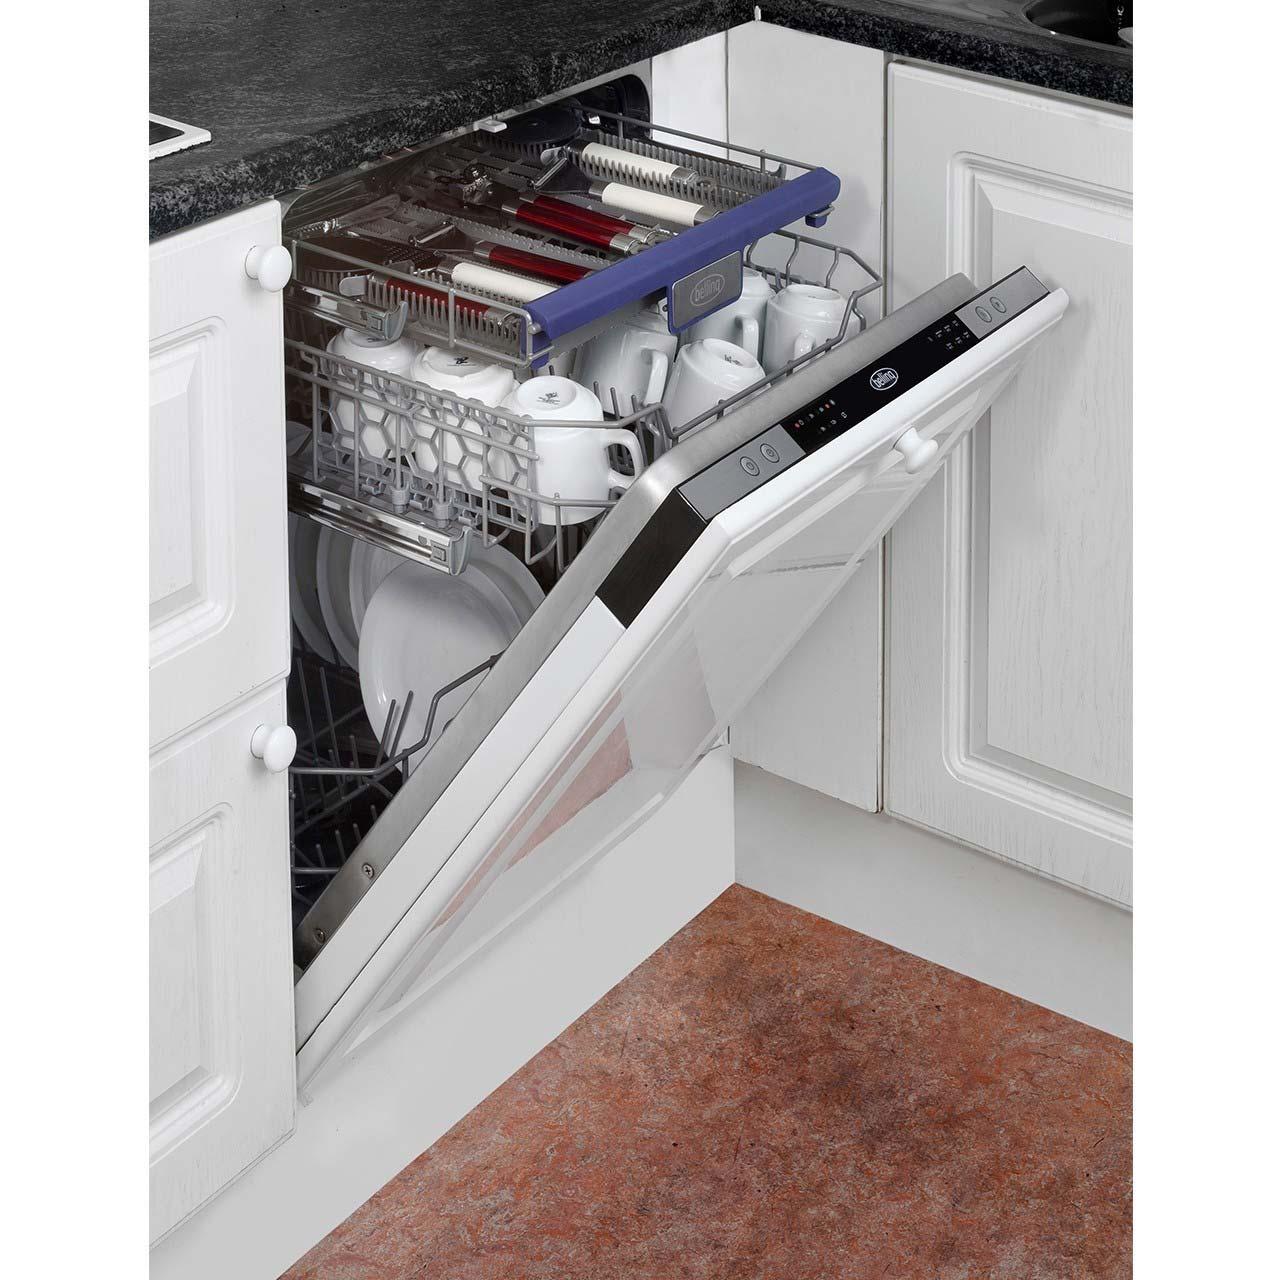 Belling 14 Place Integrated Dishwasher | BID1461